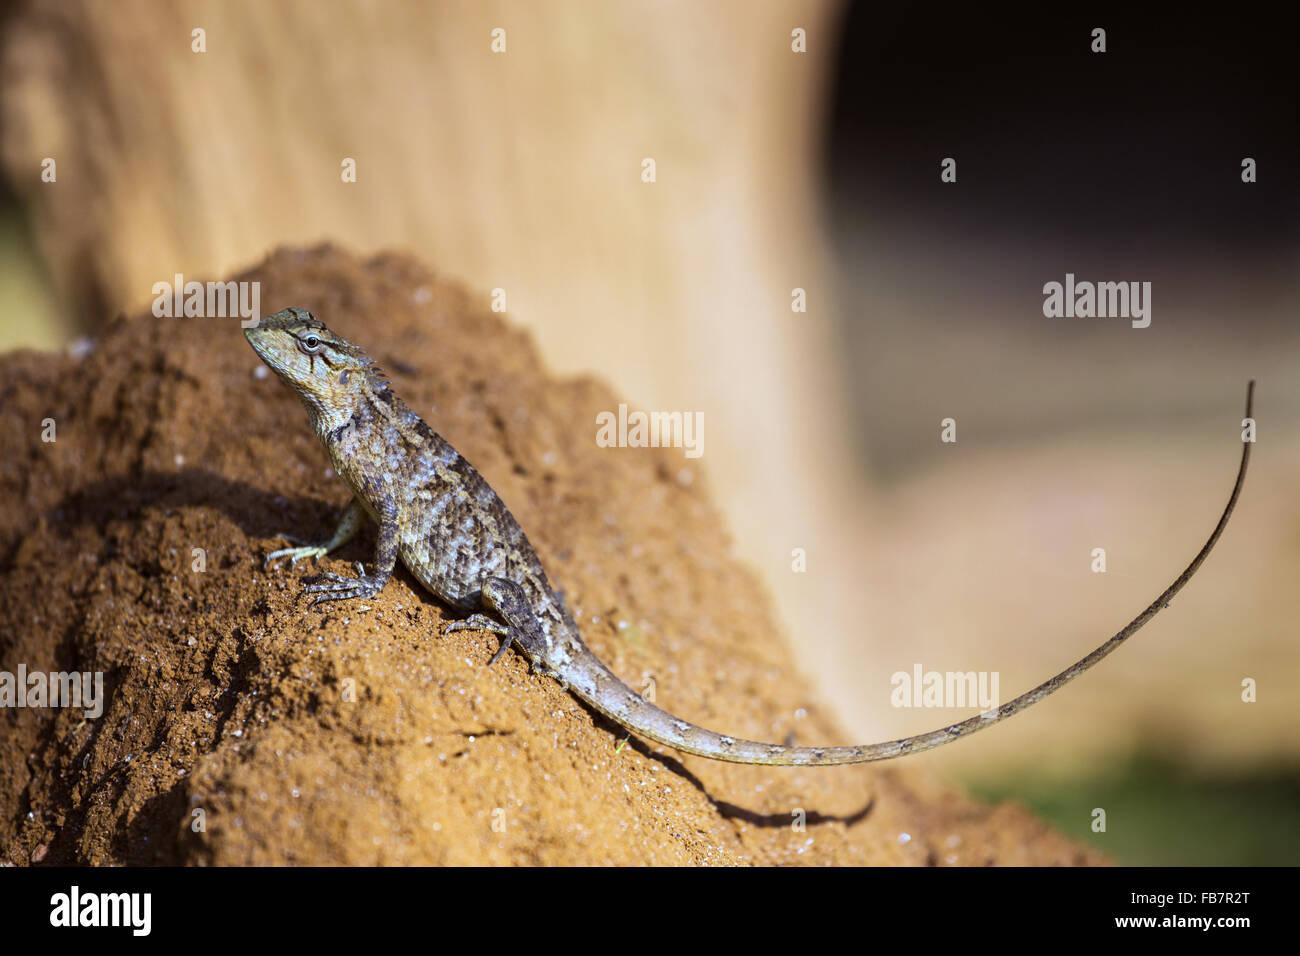 Brown-patched Kangaroo lizard, Wiegmann's Agama, Sri Lankan Kangaroo Lizard (Otocryptis wiegmanni) - Stock Image